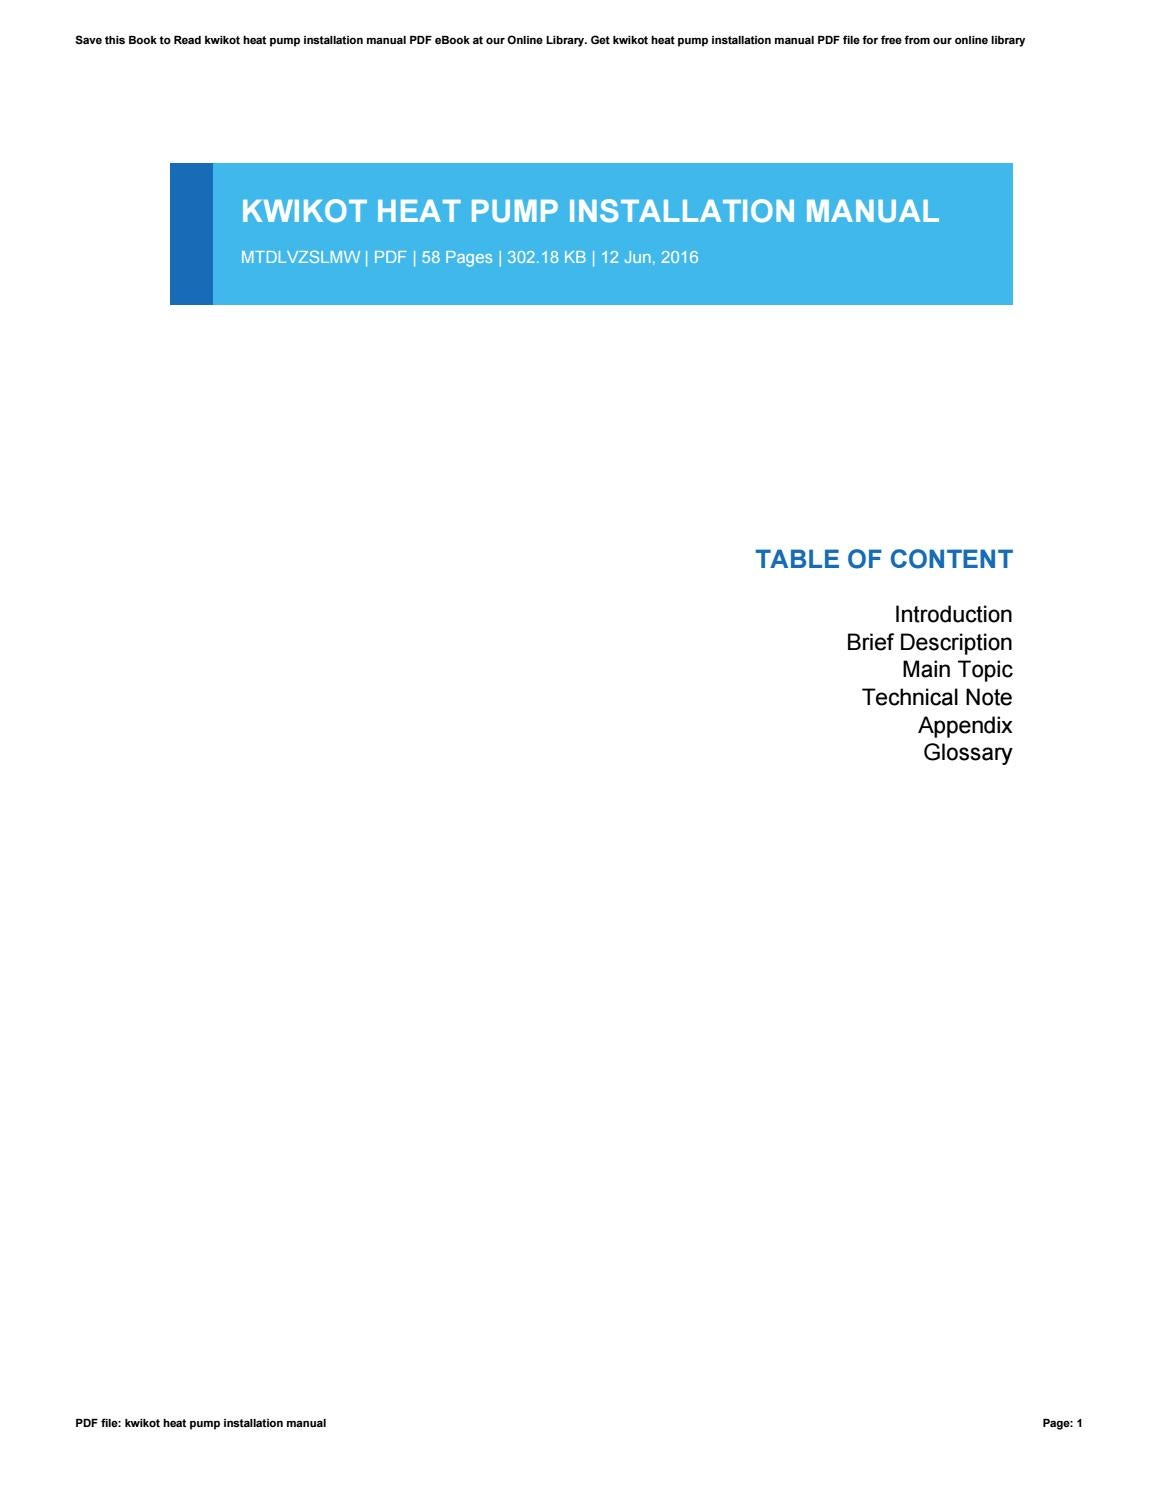 livewell pump installation instructions